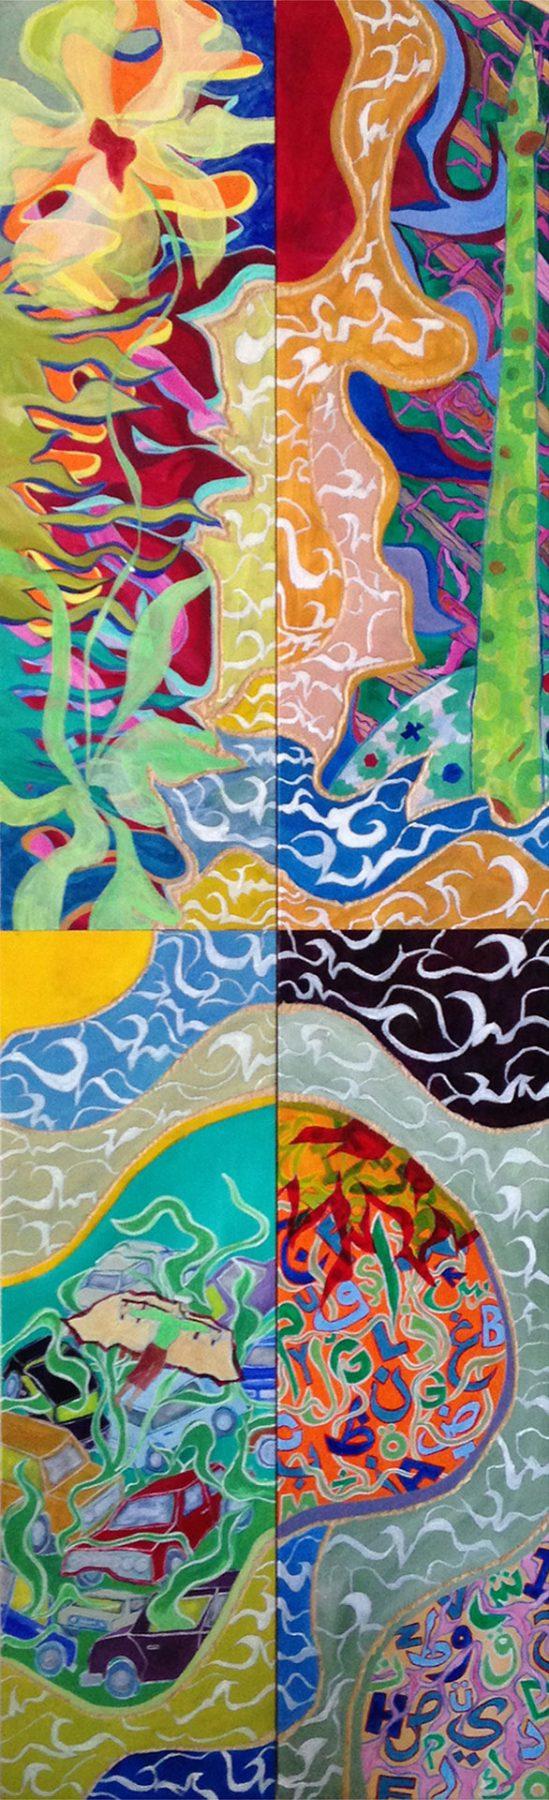 Hezârfen (2016) acrylic on wood (4 panels) 1.60H x 0.51W meters